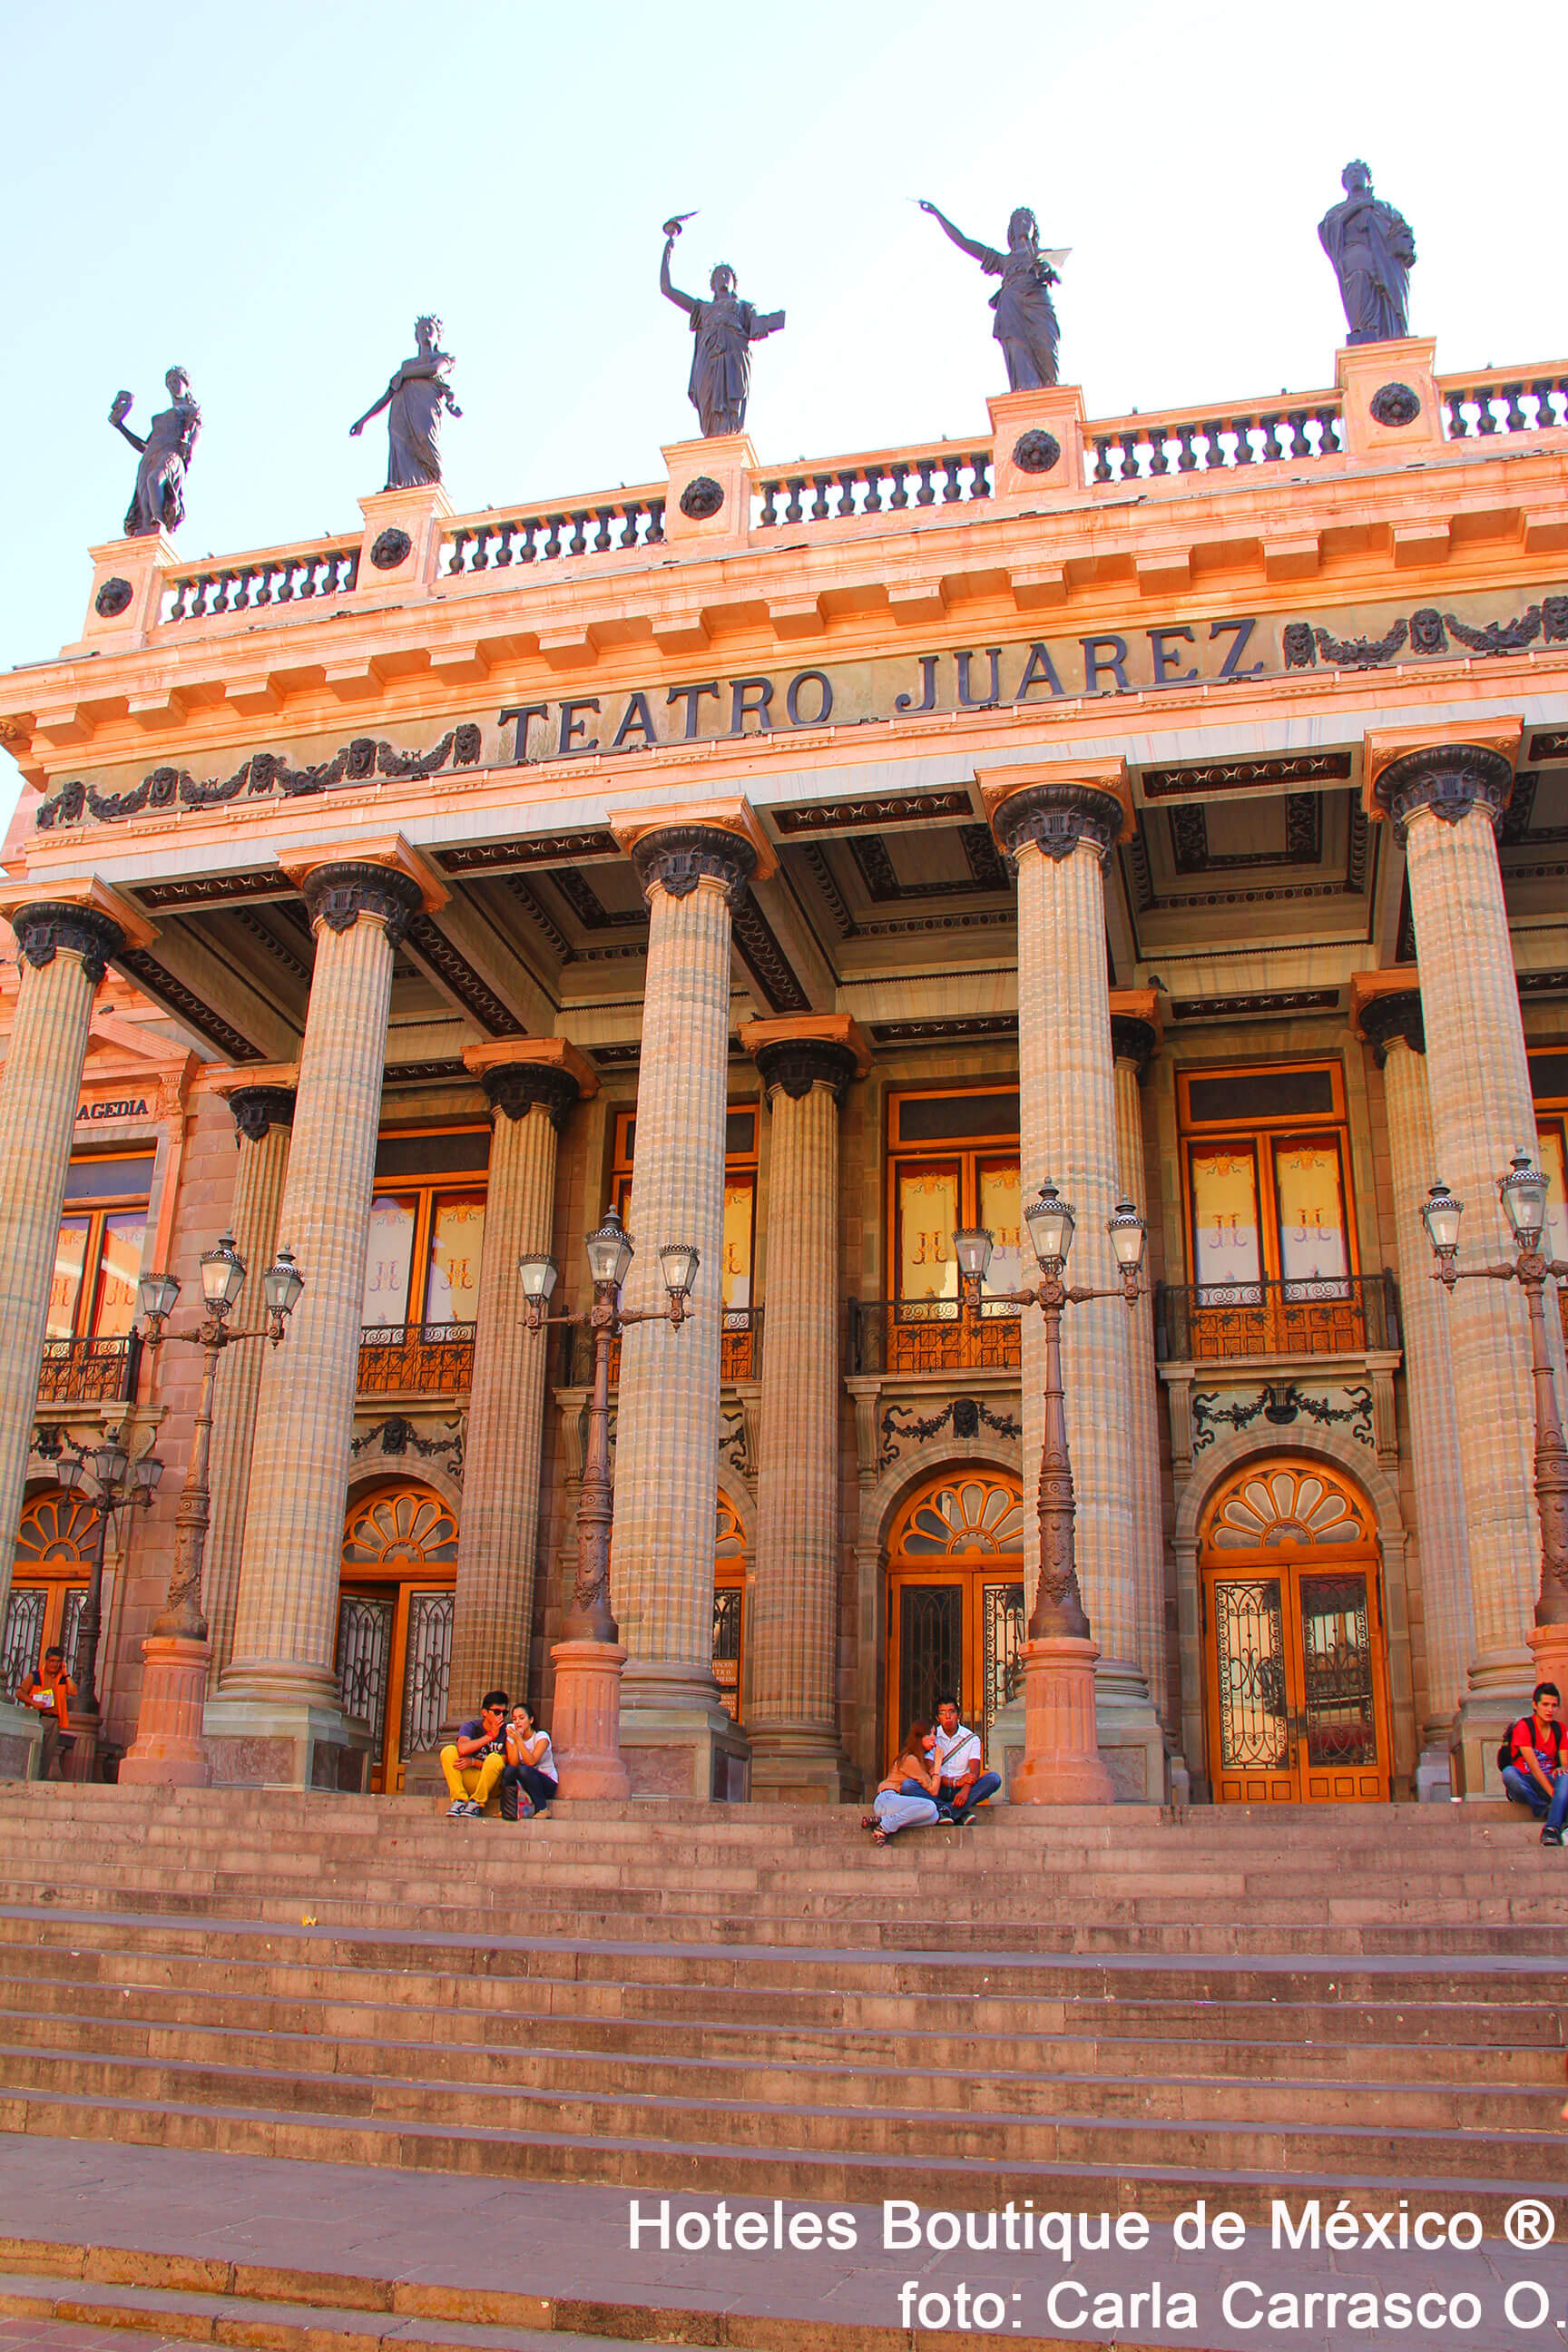 hoteles-boutique-de-mexico-enterate-de-la-locura-al-idealismo-festival-internacional-cervantino-2016-1